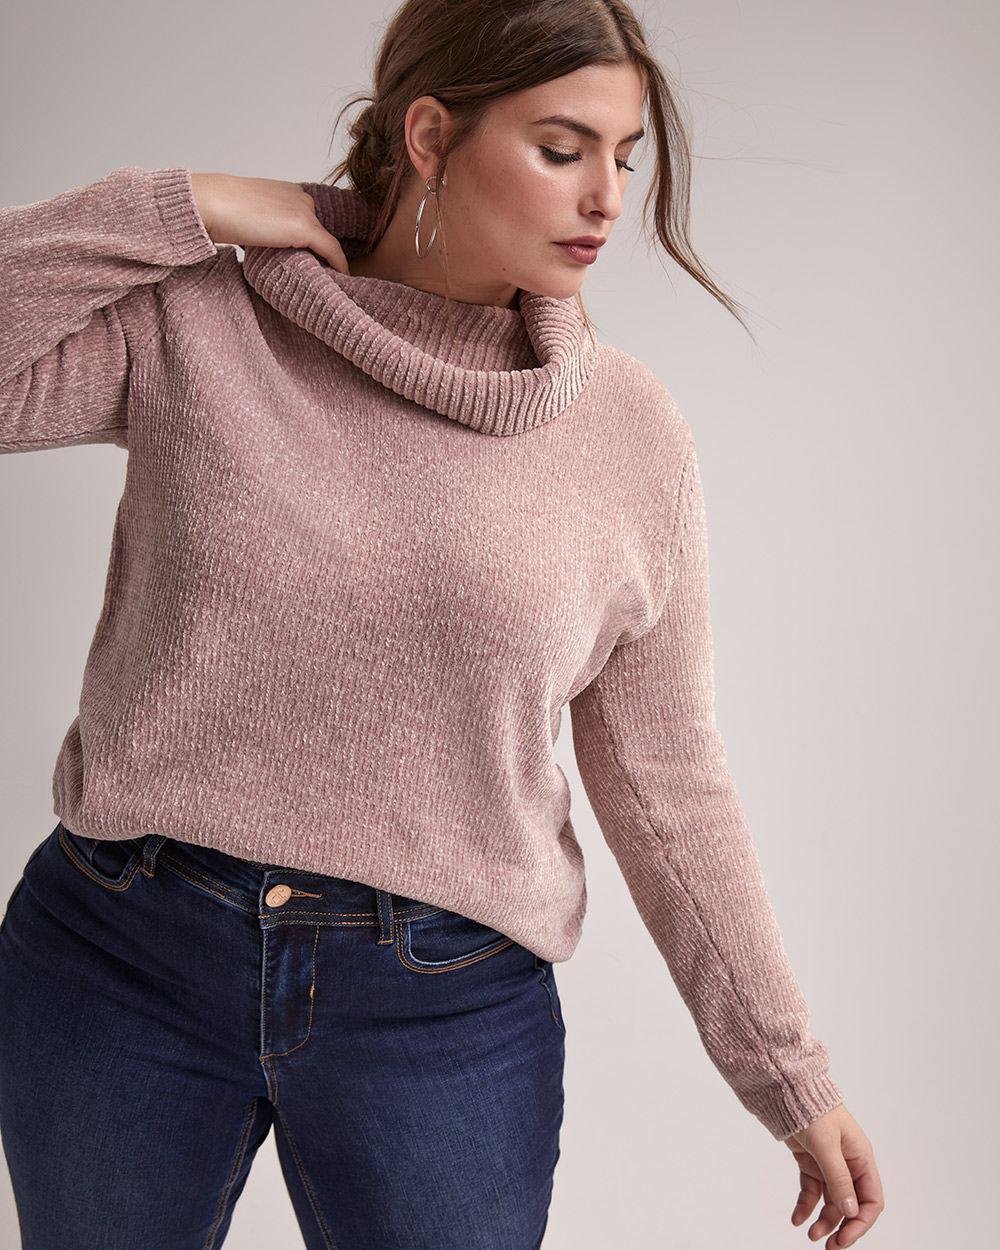 5eb90ce5033 Lyst - Addition Elle Cowl Neck Sweater With Round Hem - Michel Studio